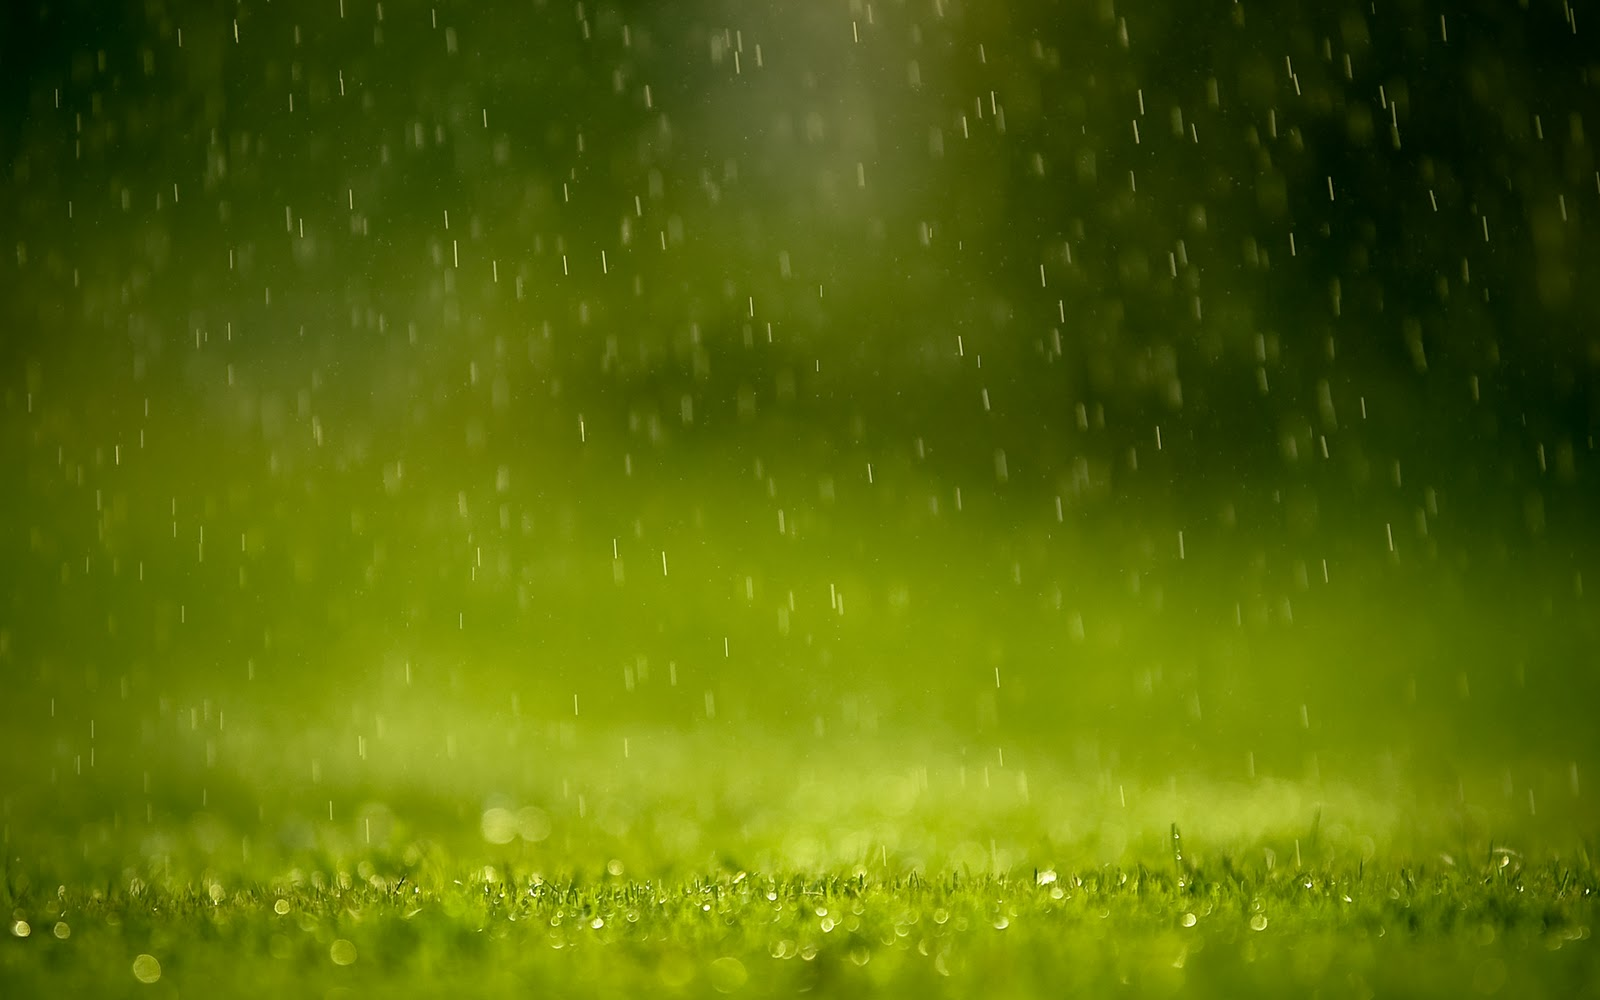 https://4.bp.blogspot.com/_2UbsSBz9ckE/S7Uu5pWQXwI/AAAAAAAABK0/k0c7GskSCAc/s1600/Rain_Drops_High_Definition_HD_Wallpapers%2B1.jpg